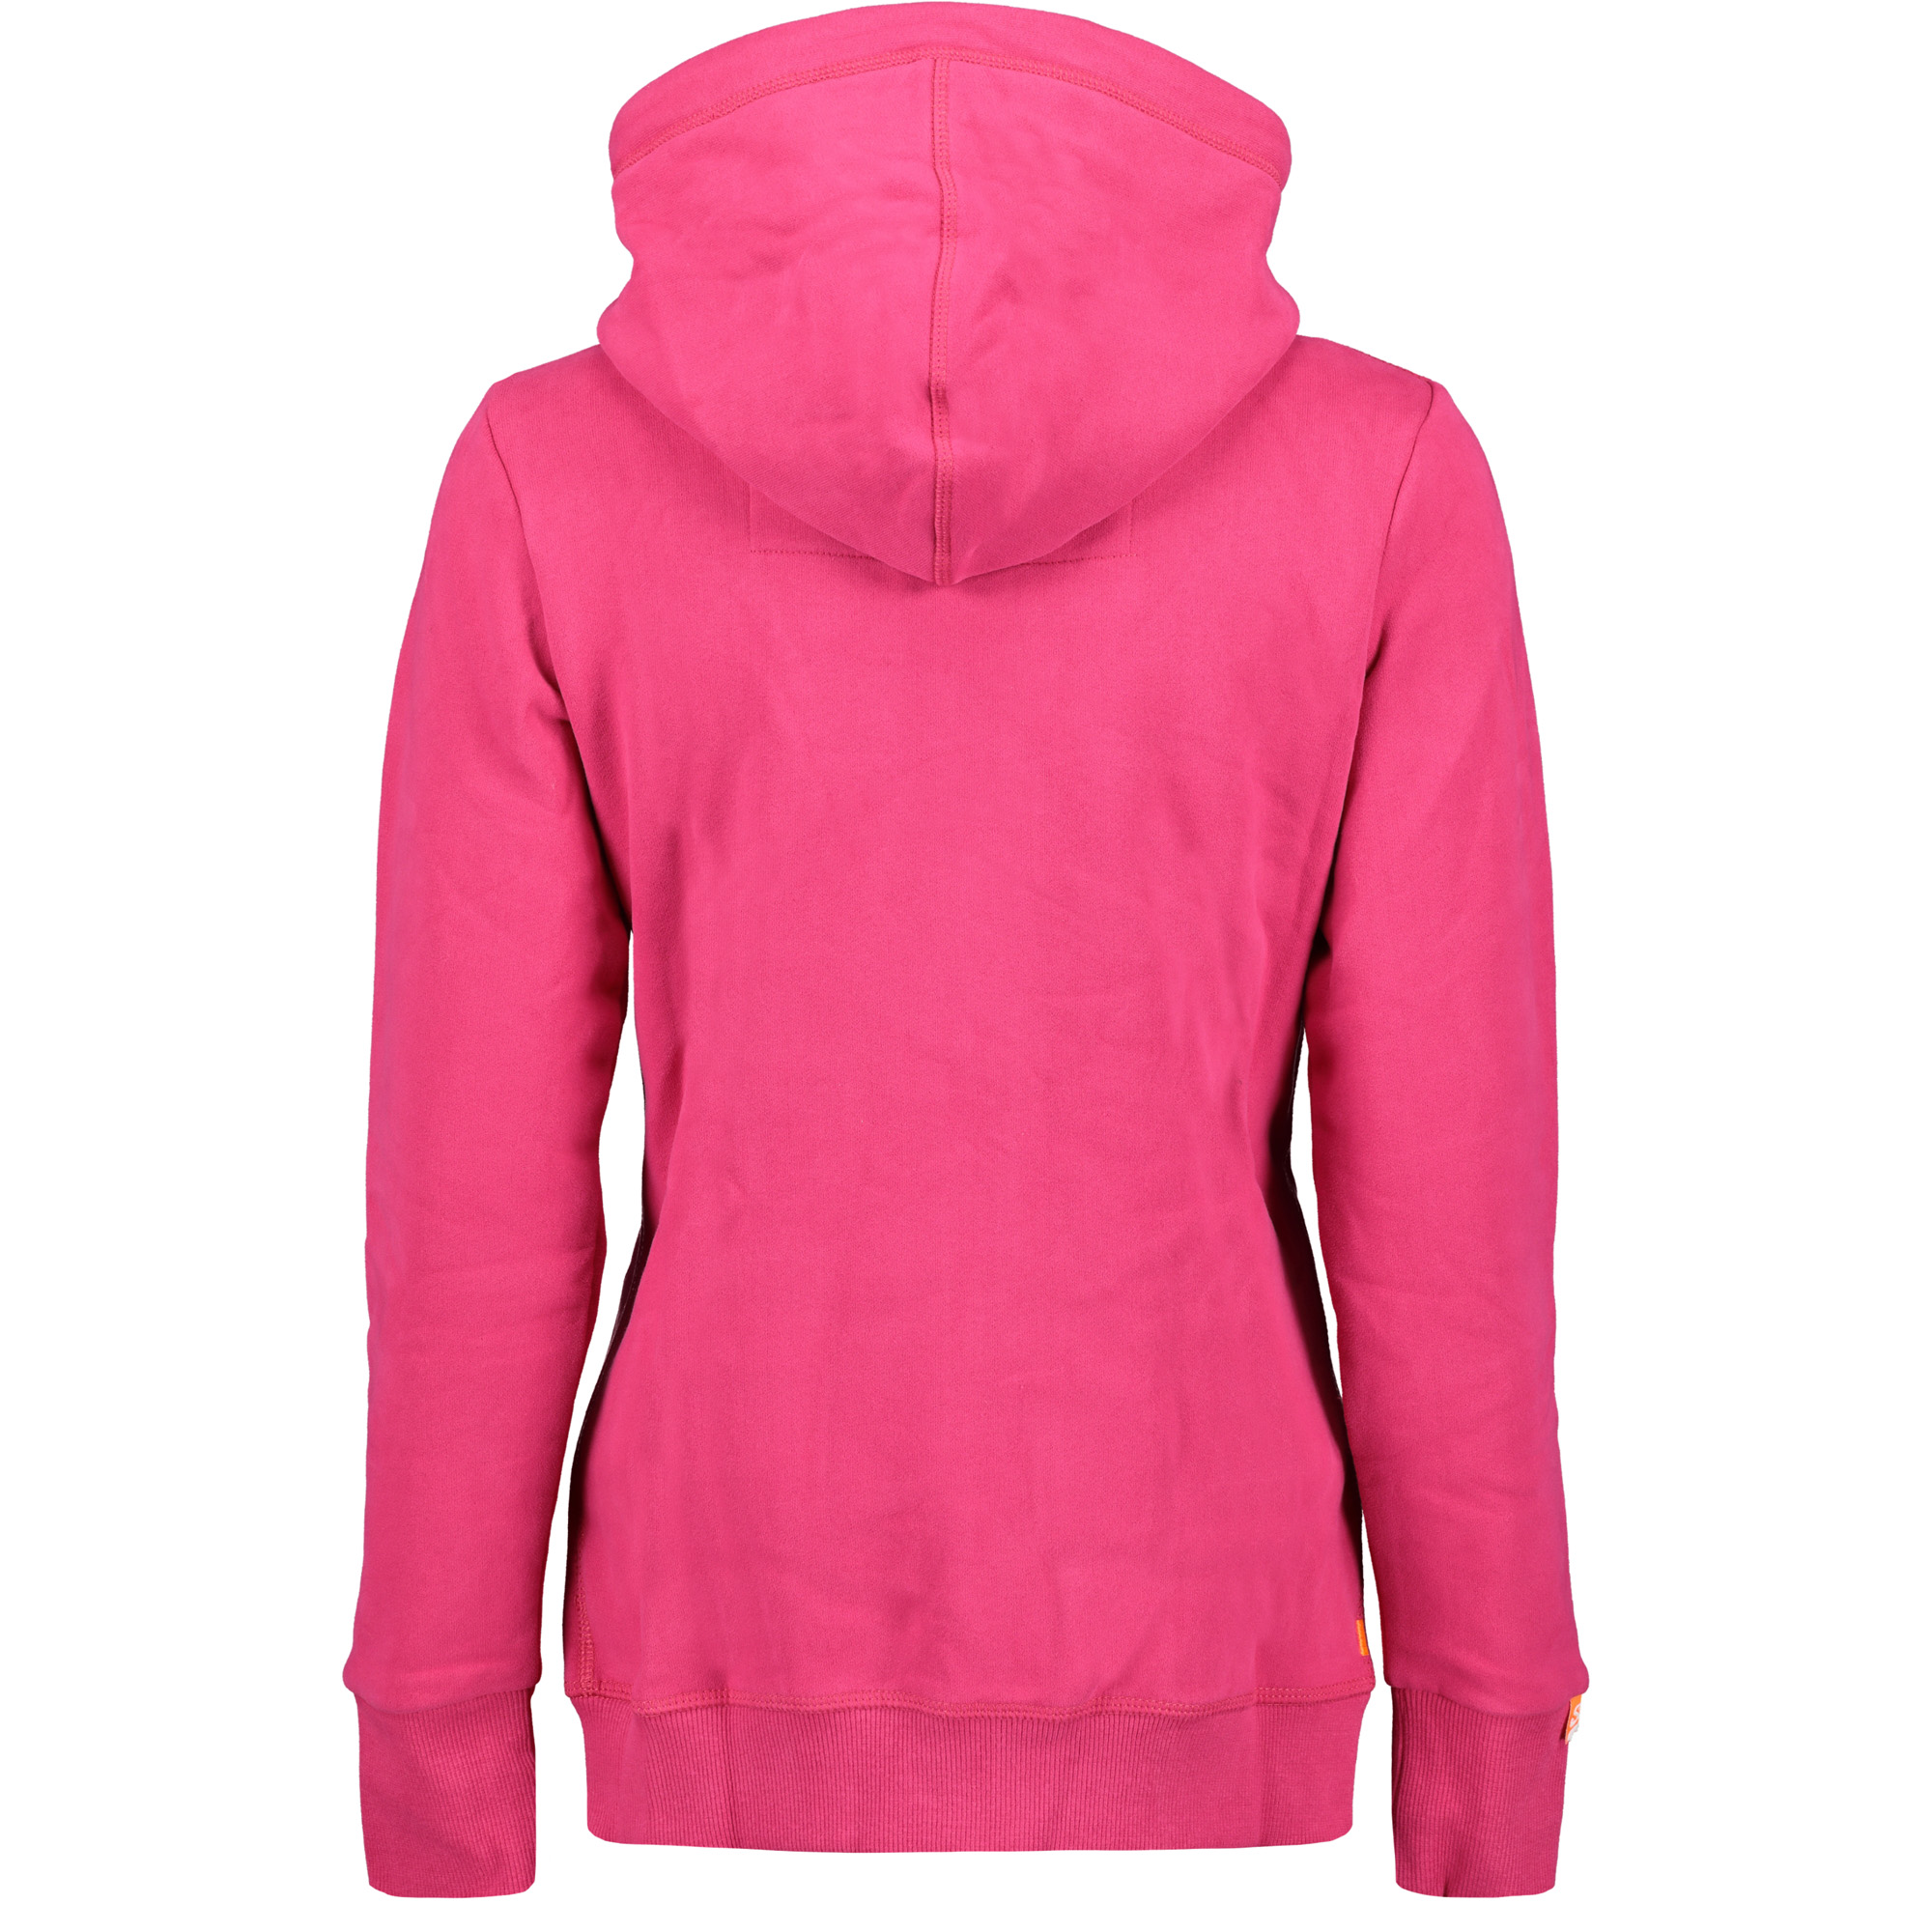 quality design 56490 ea03b Superdry Orange Label Classic Ziphood Damen Sweatjacke cabaret pink